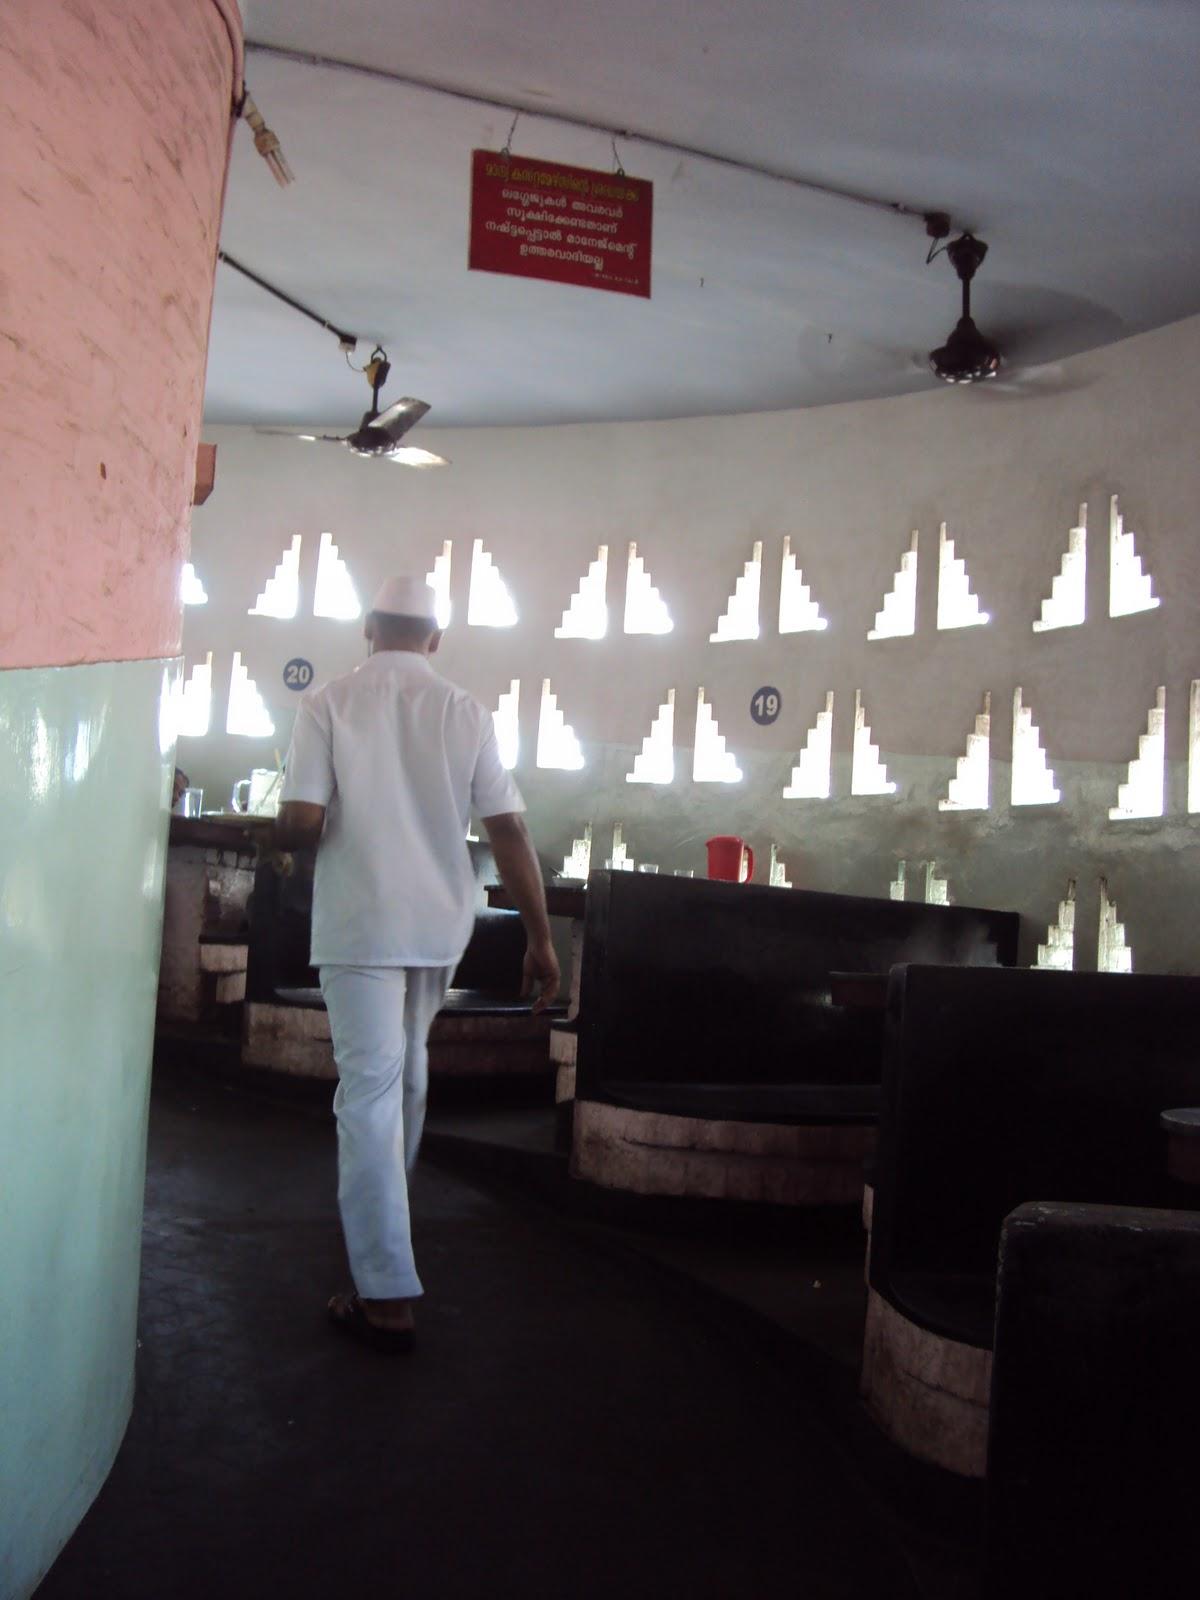 trivandrum hindu singles Vivaah - looking for thiruvananthapuram grooms or thiruvananthapuram boys find single boy, groom in thiruvananthapuram for marriage in the leading 100% free thiruvananthapuram matrimonials site.